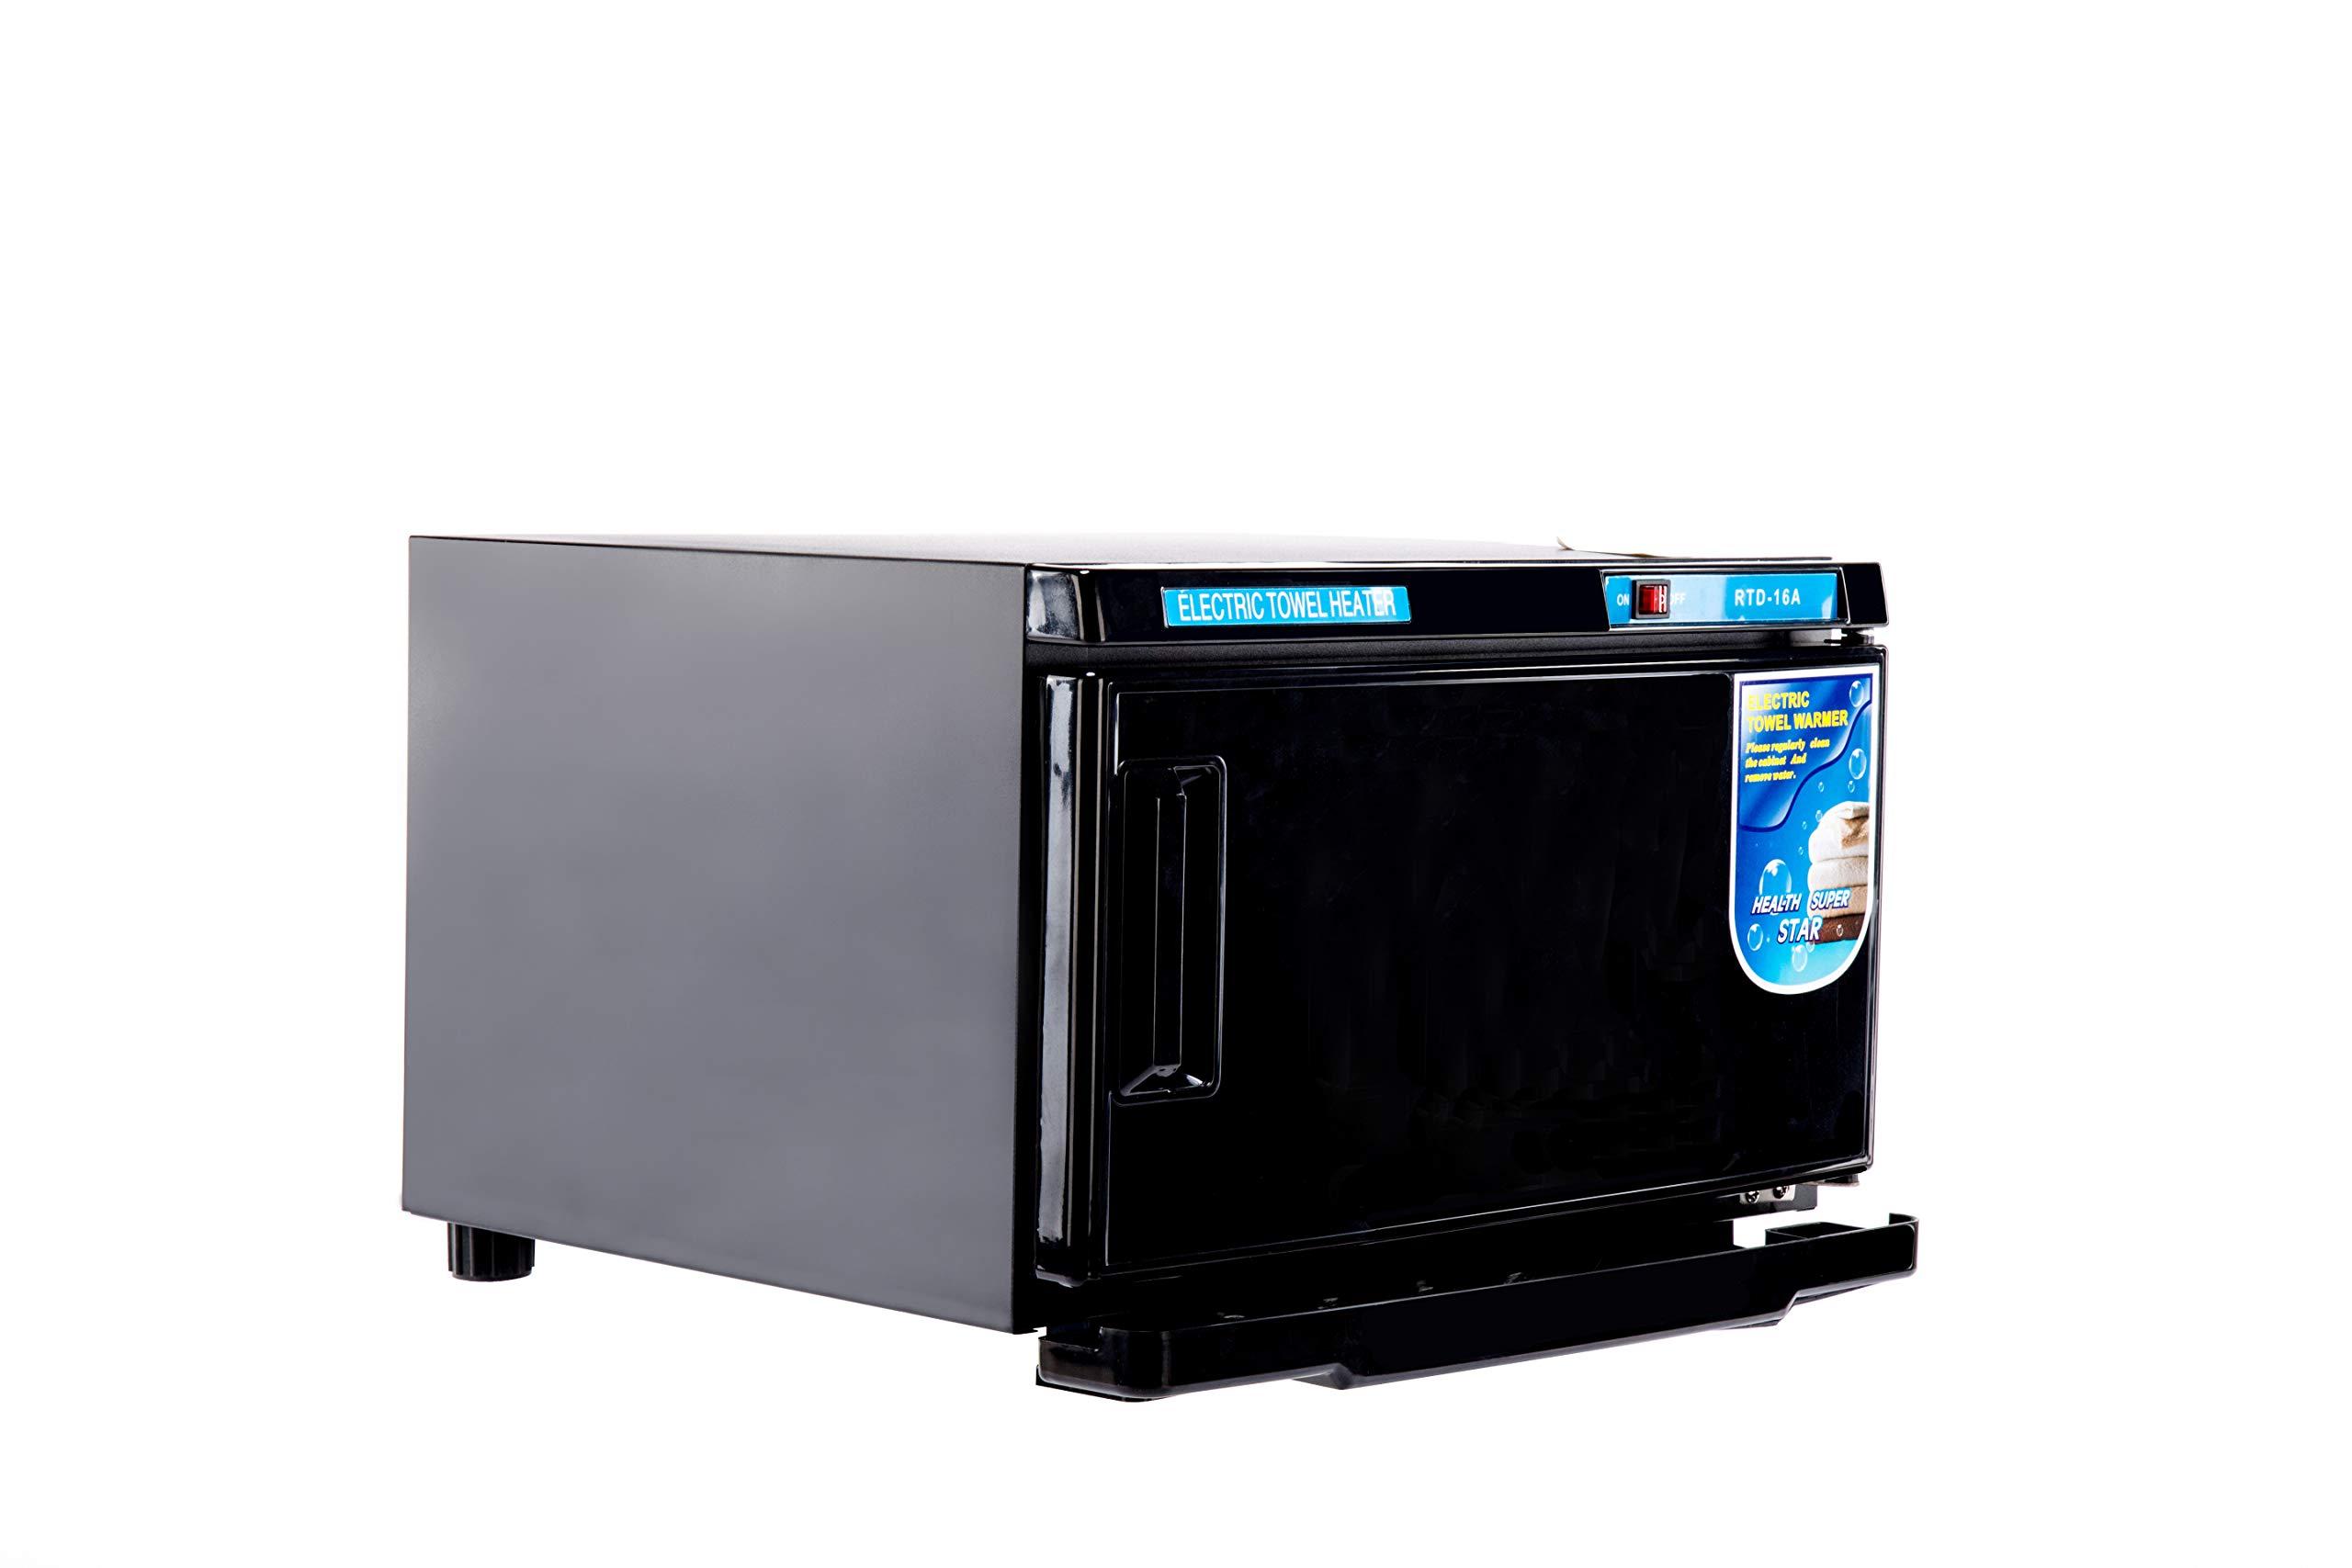 Barberpub 2in1 16L UV Sterilizer Hot Towel Warmer Cabinet Facial Skin Spa Massage Hair Beauty Salon Equipment TS05 (Black)